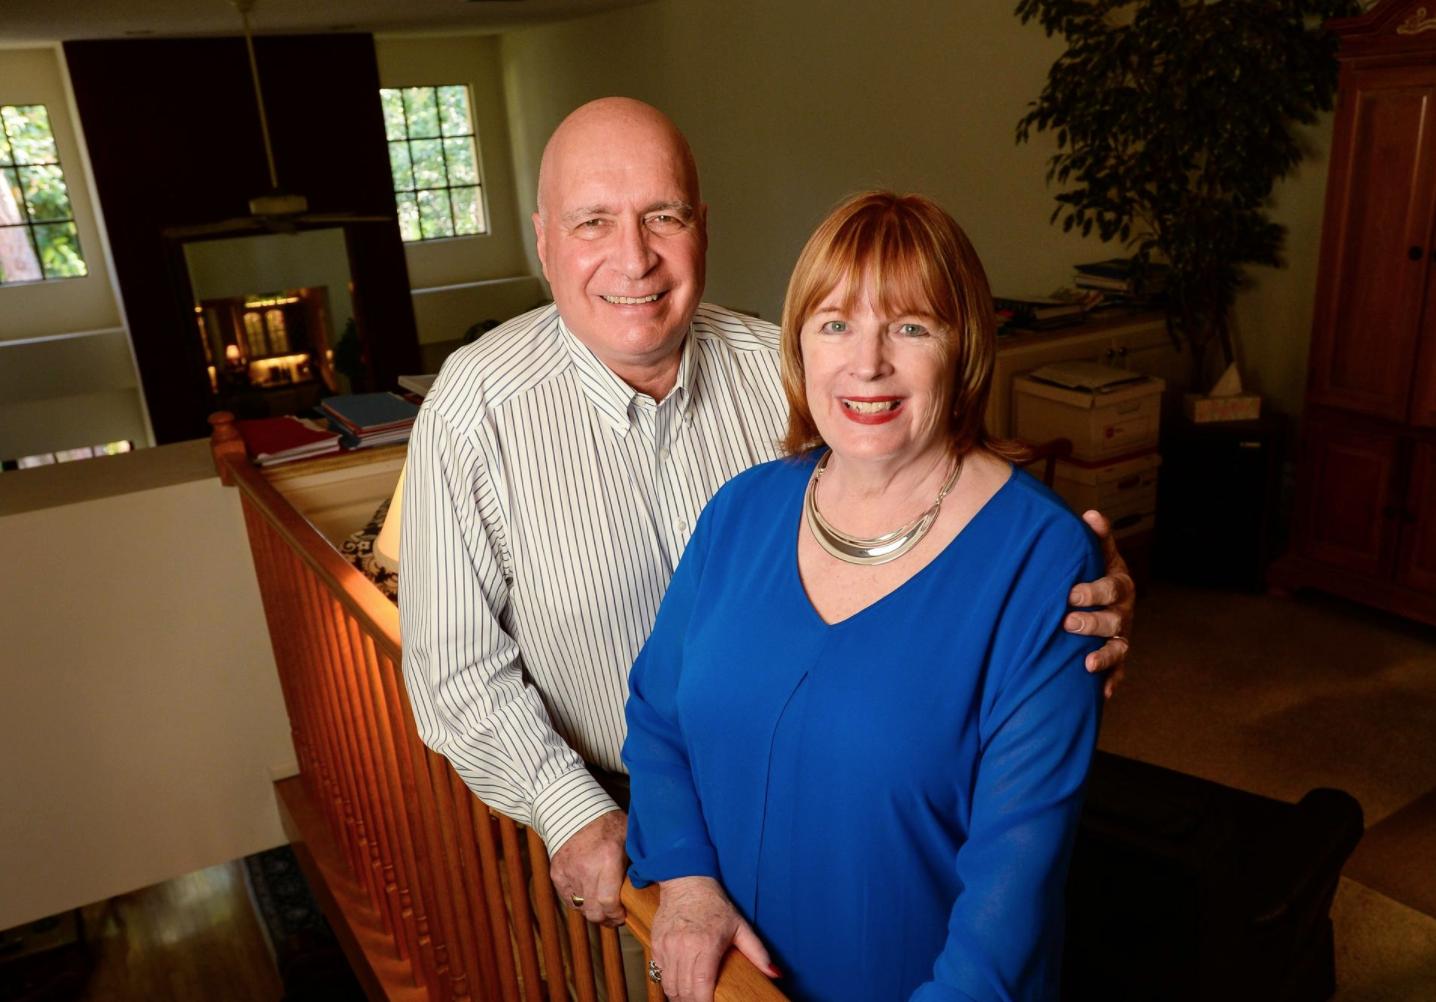 Sarasota couple play matchmakers for companies and executives